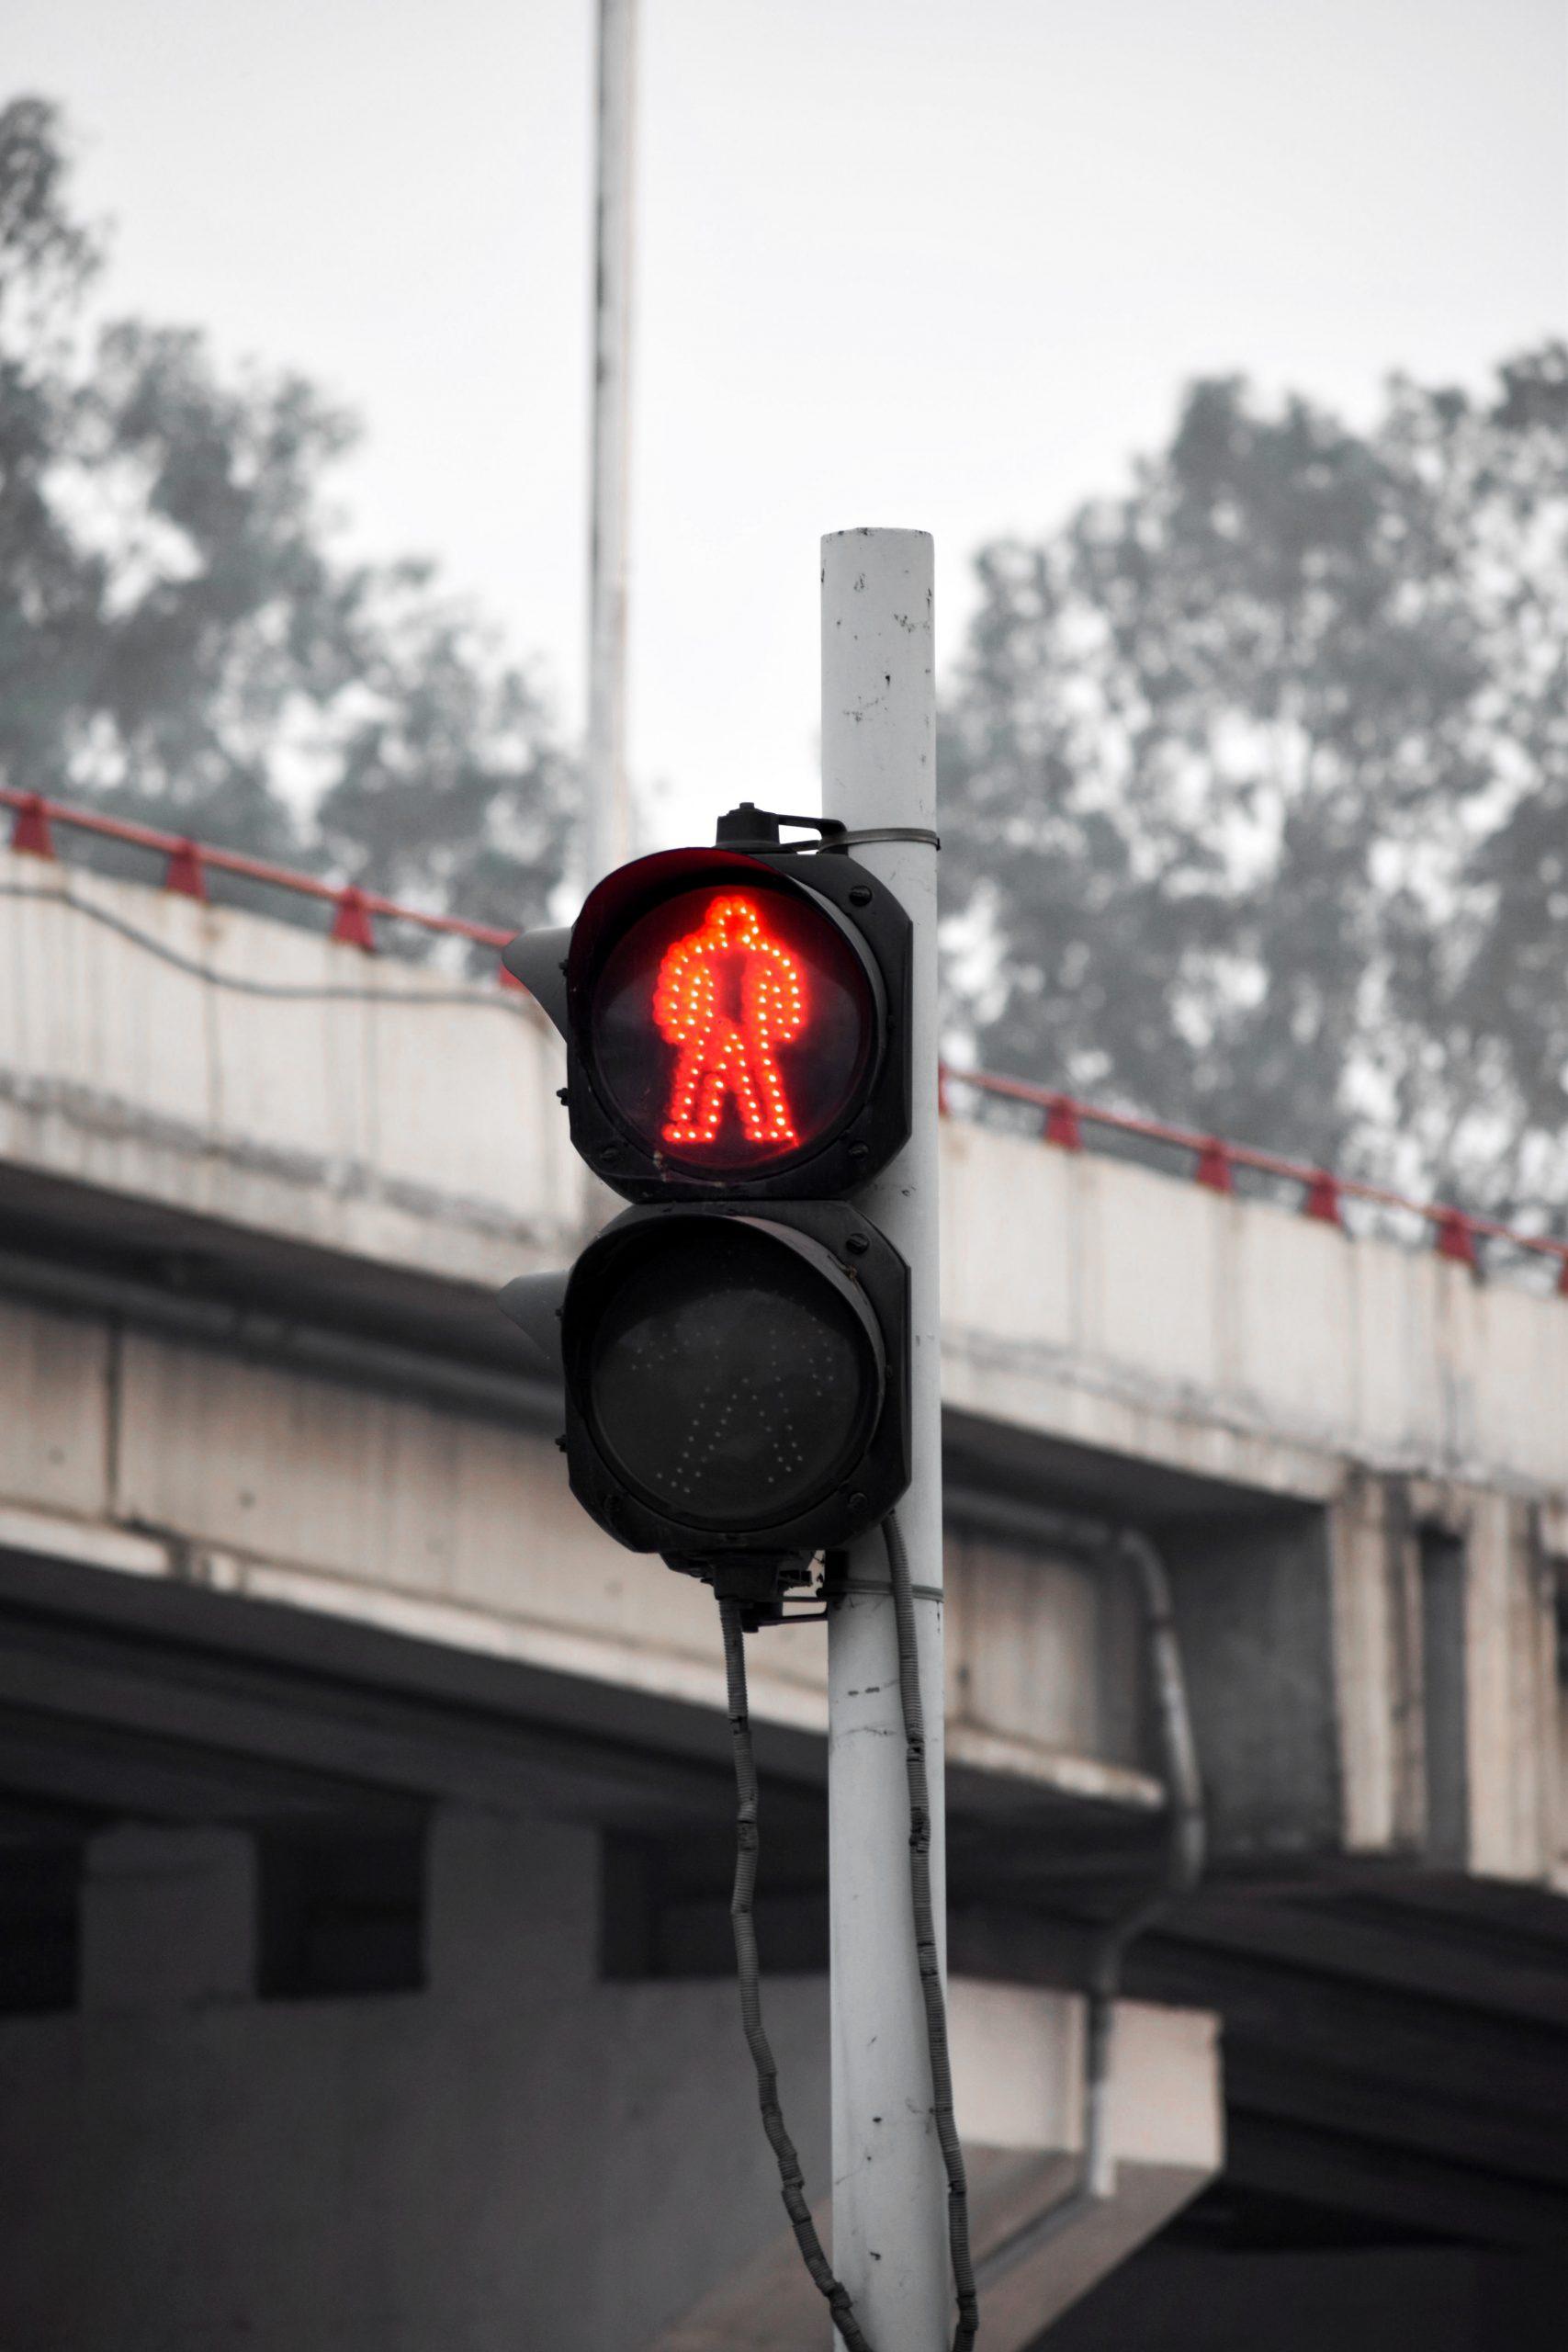 A traffic signal sign